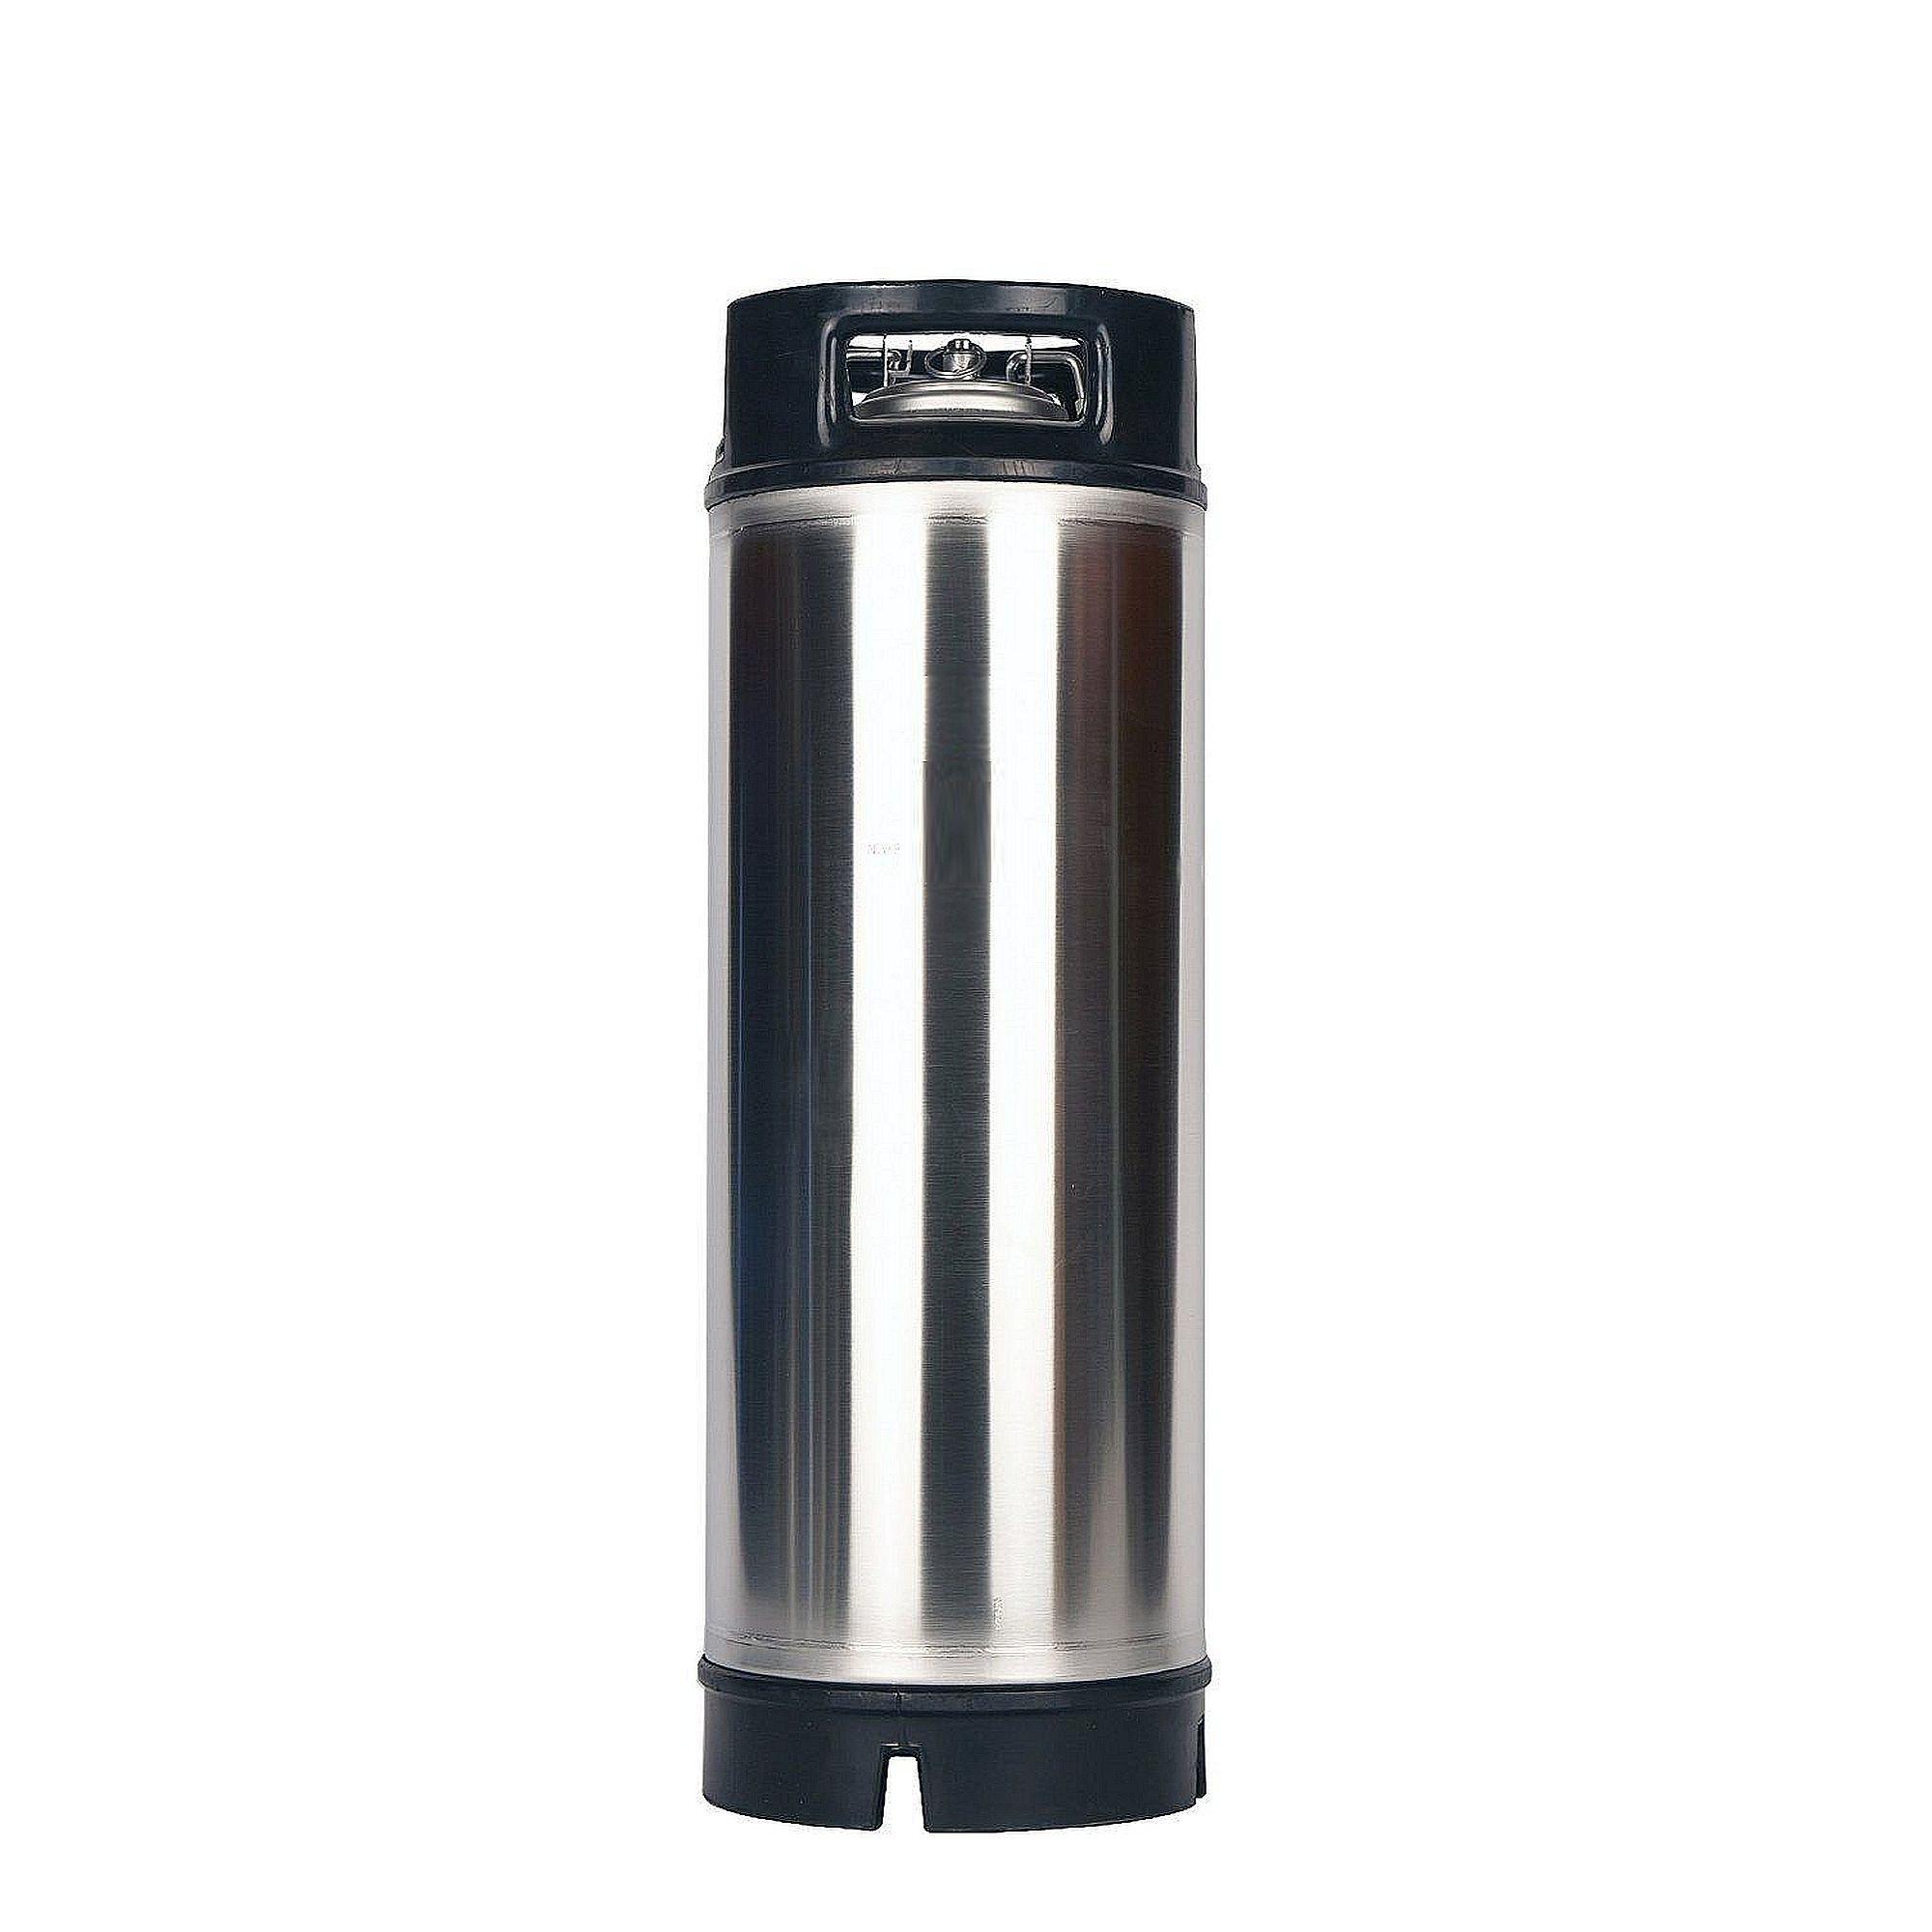 5 Gallon Keg New Ball Lock Cornelius Style Beer Soda Tea by Home Brew Stuff (Image #1)